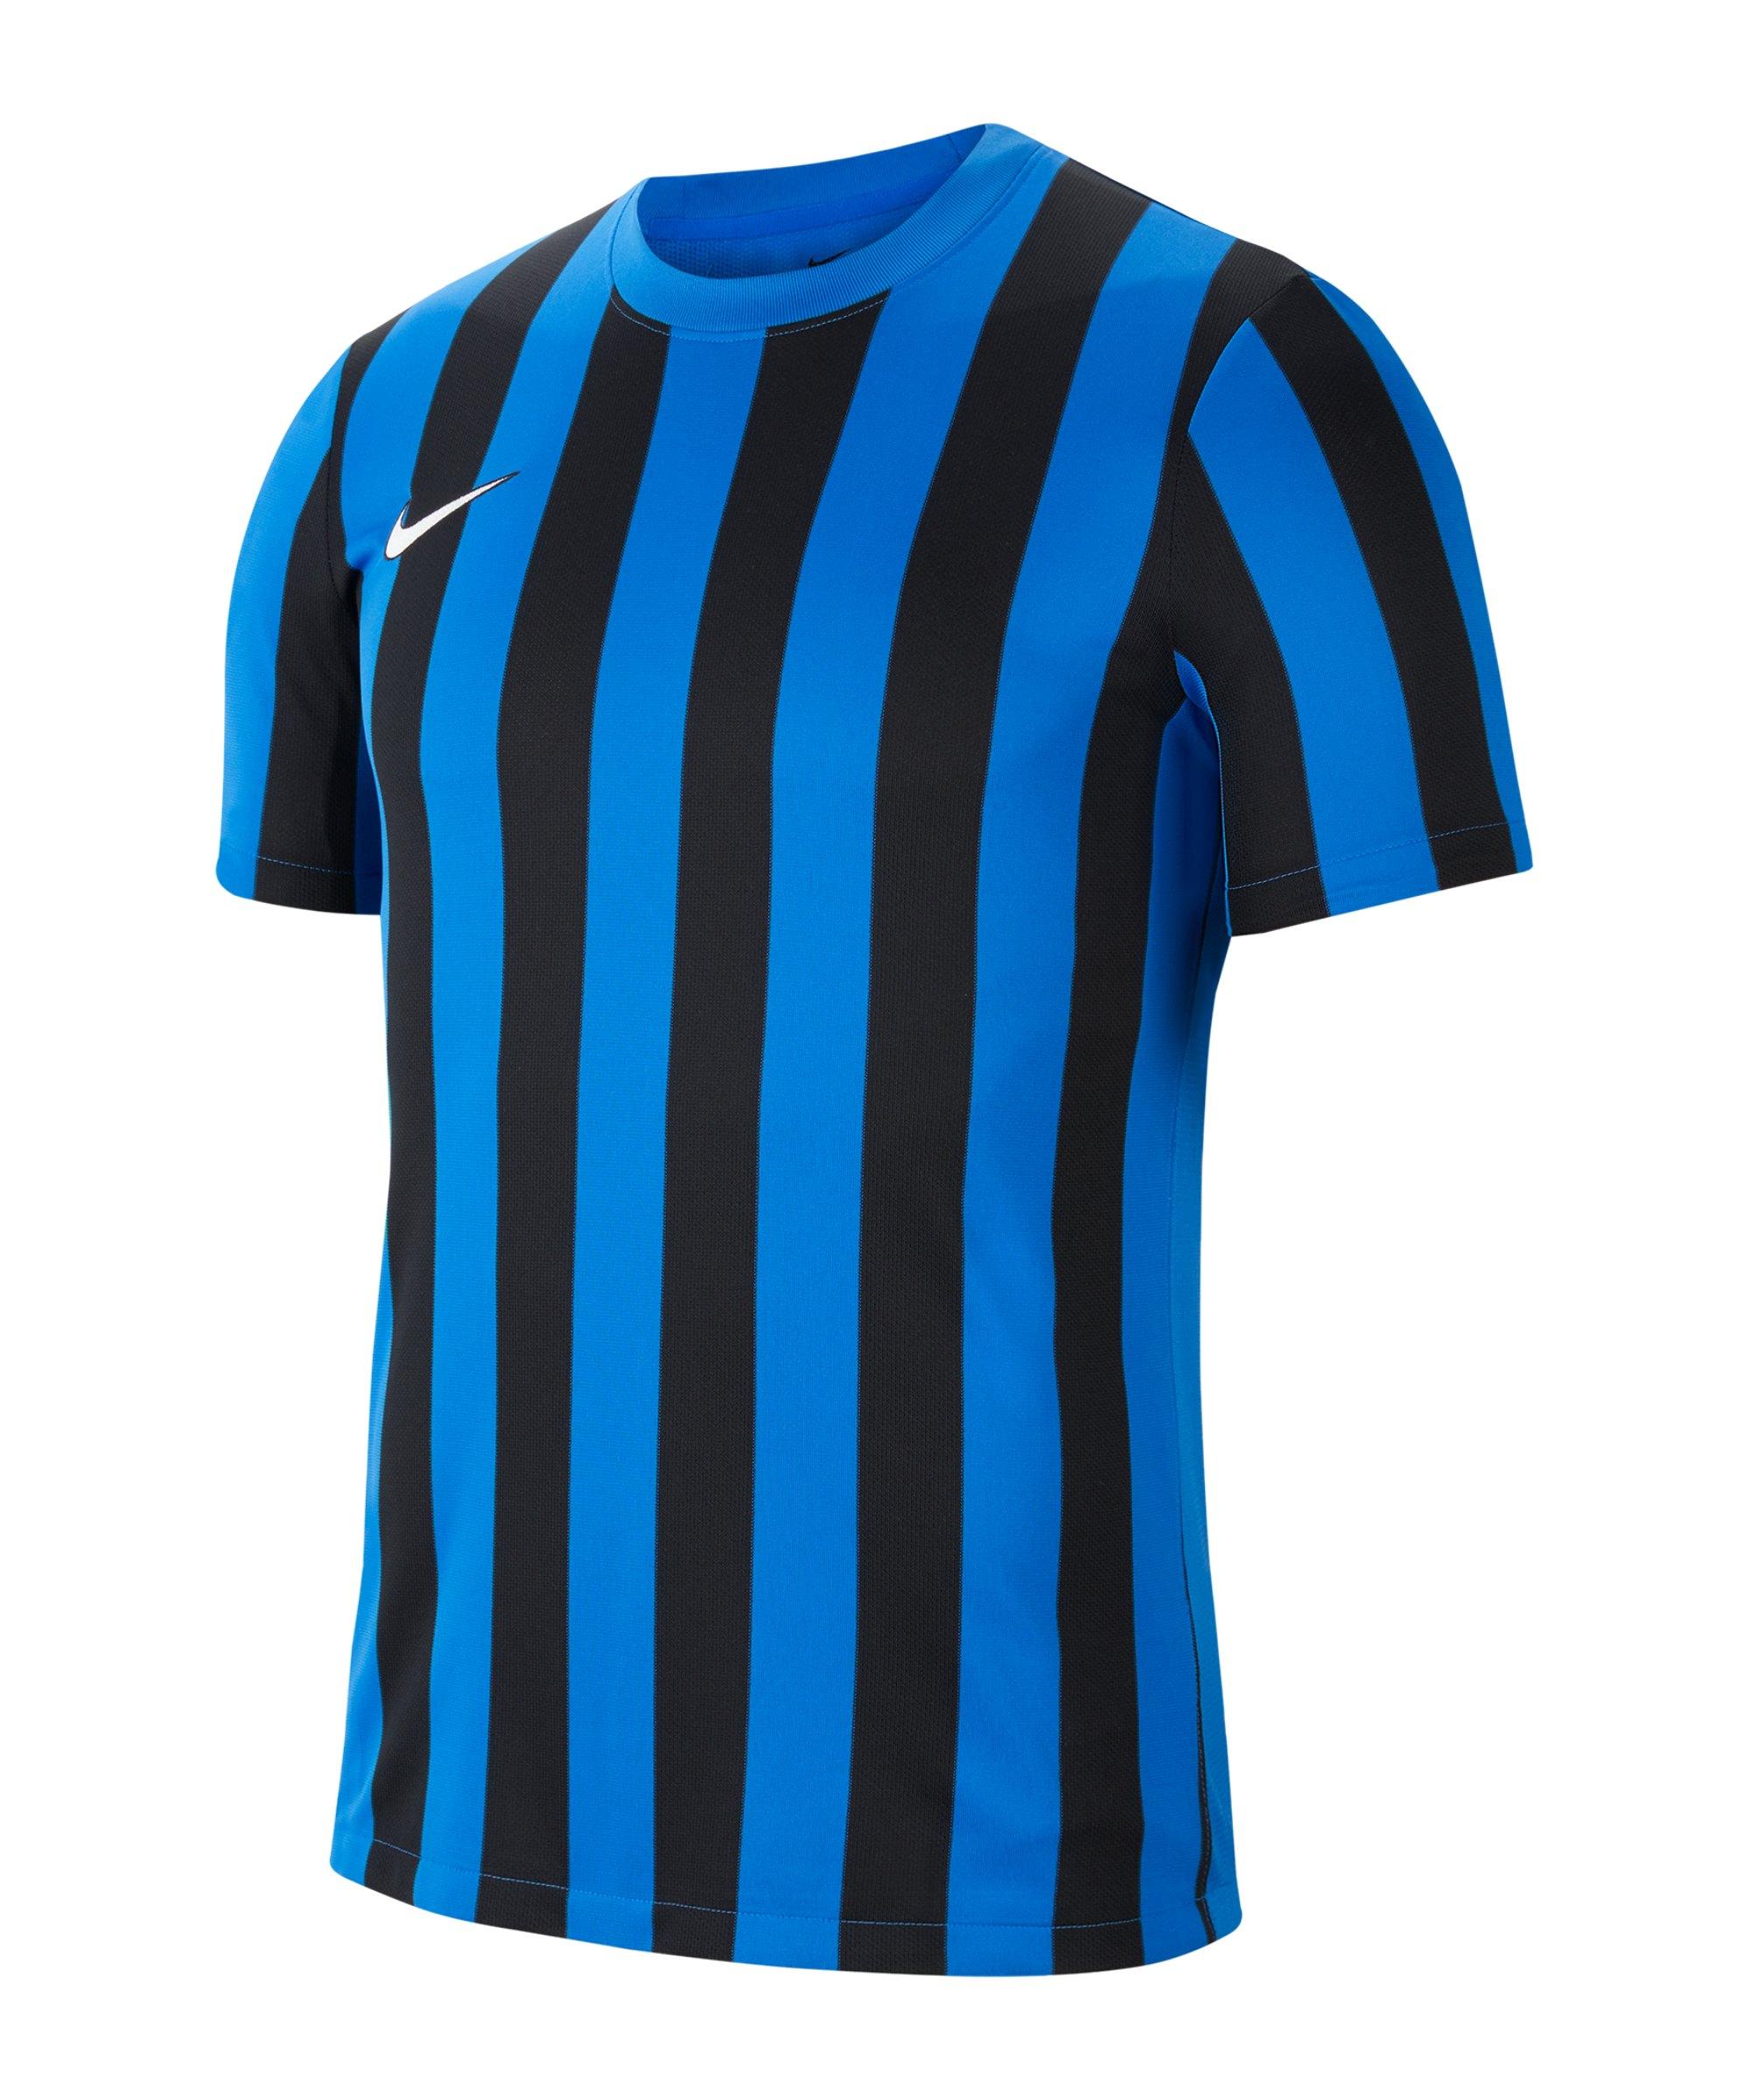 Nike Division IV Striped Trikot kurzarm Blau F463 - blau